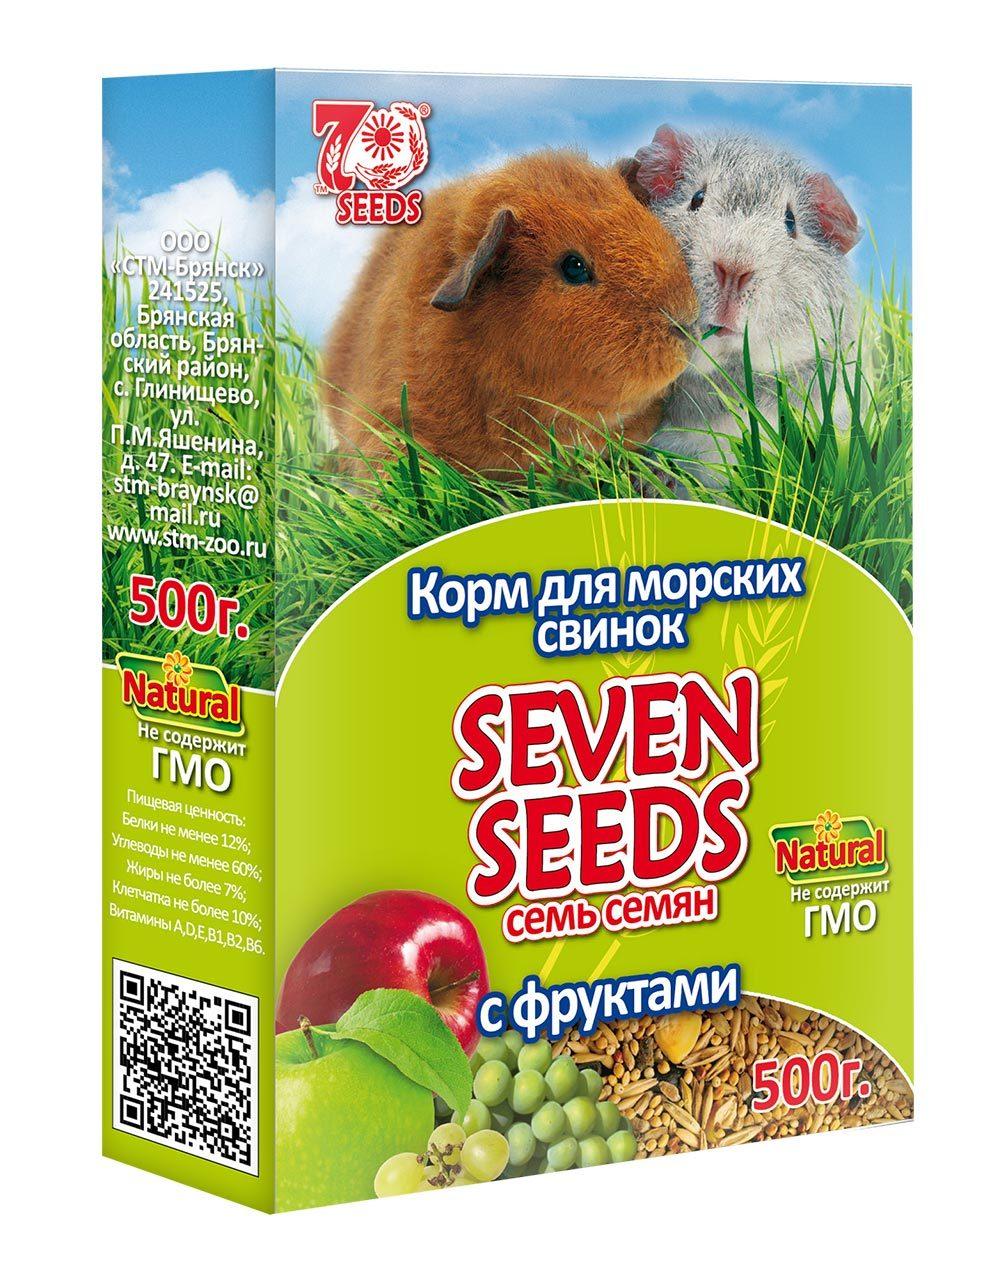 Корм Корм для морских свинок с фруктами Seven Seeds ms_fruits.jpg